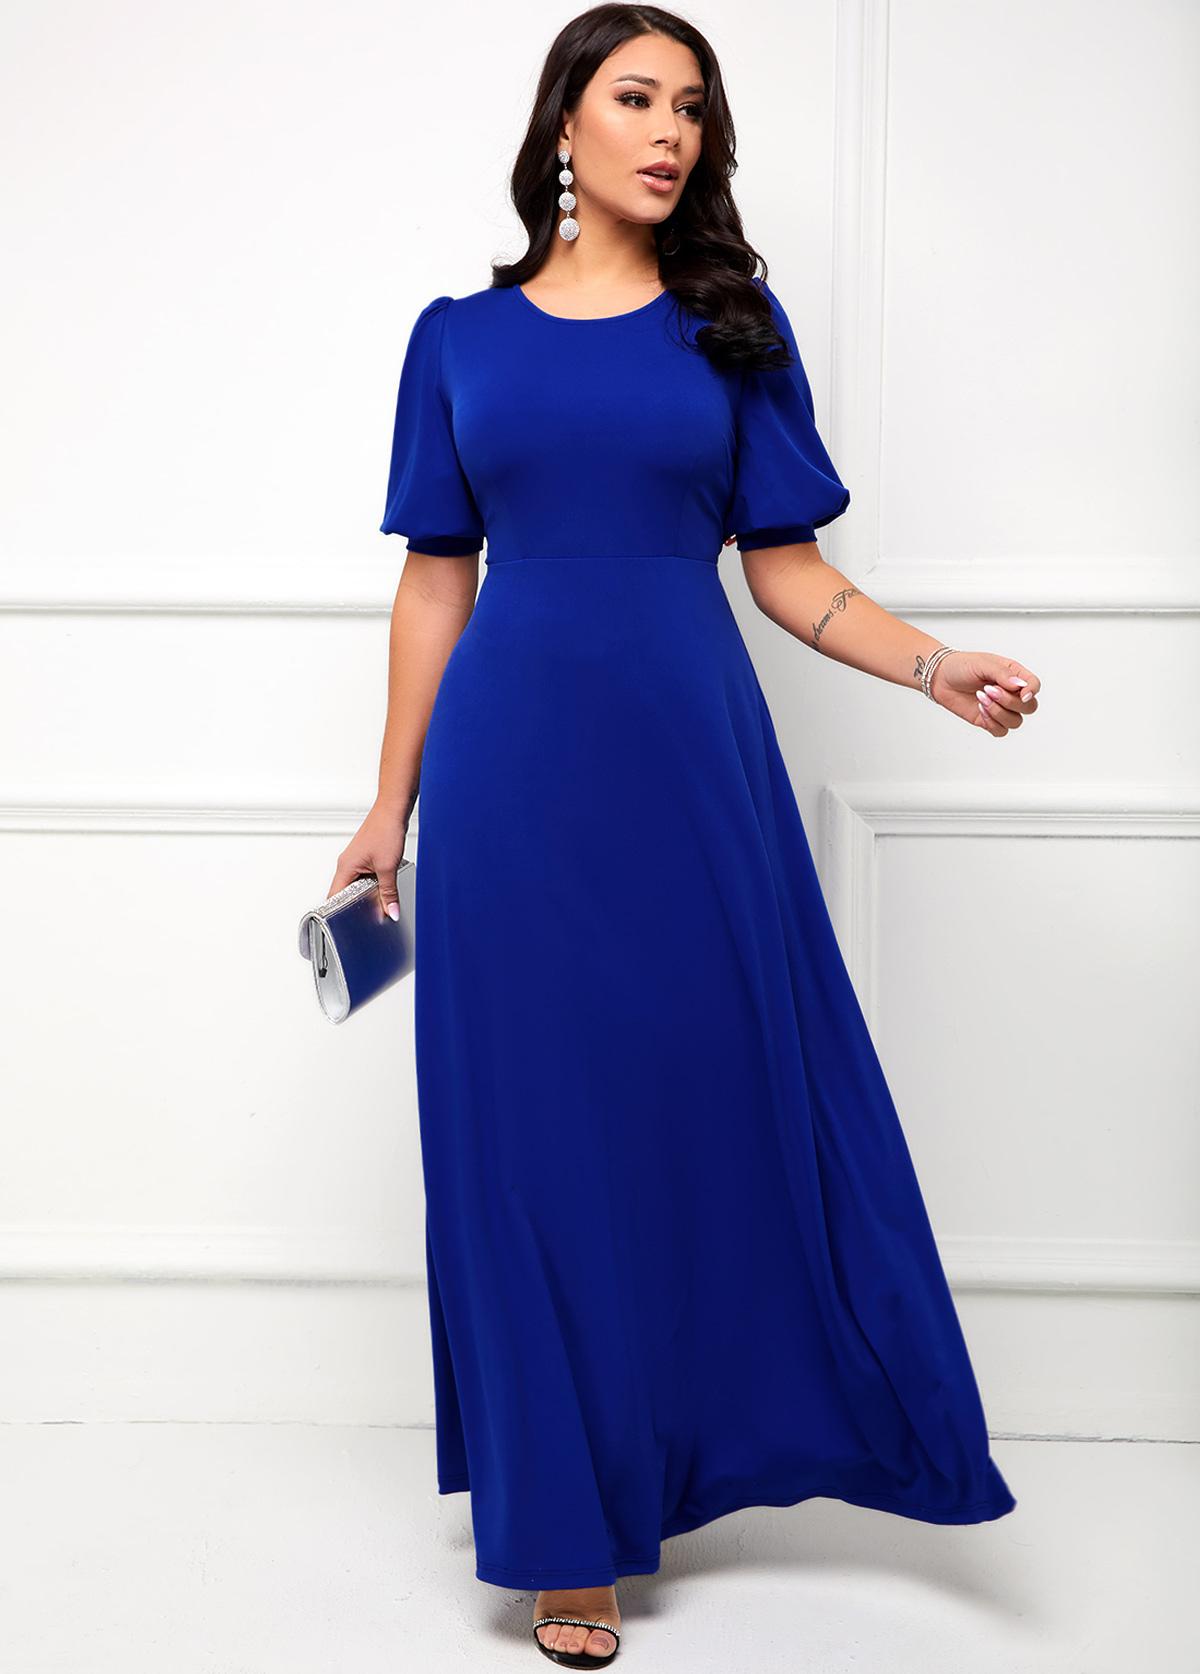 ROTITA Puff Sleeve Round Neck Maxi Dress